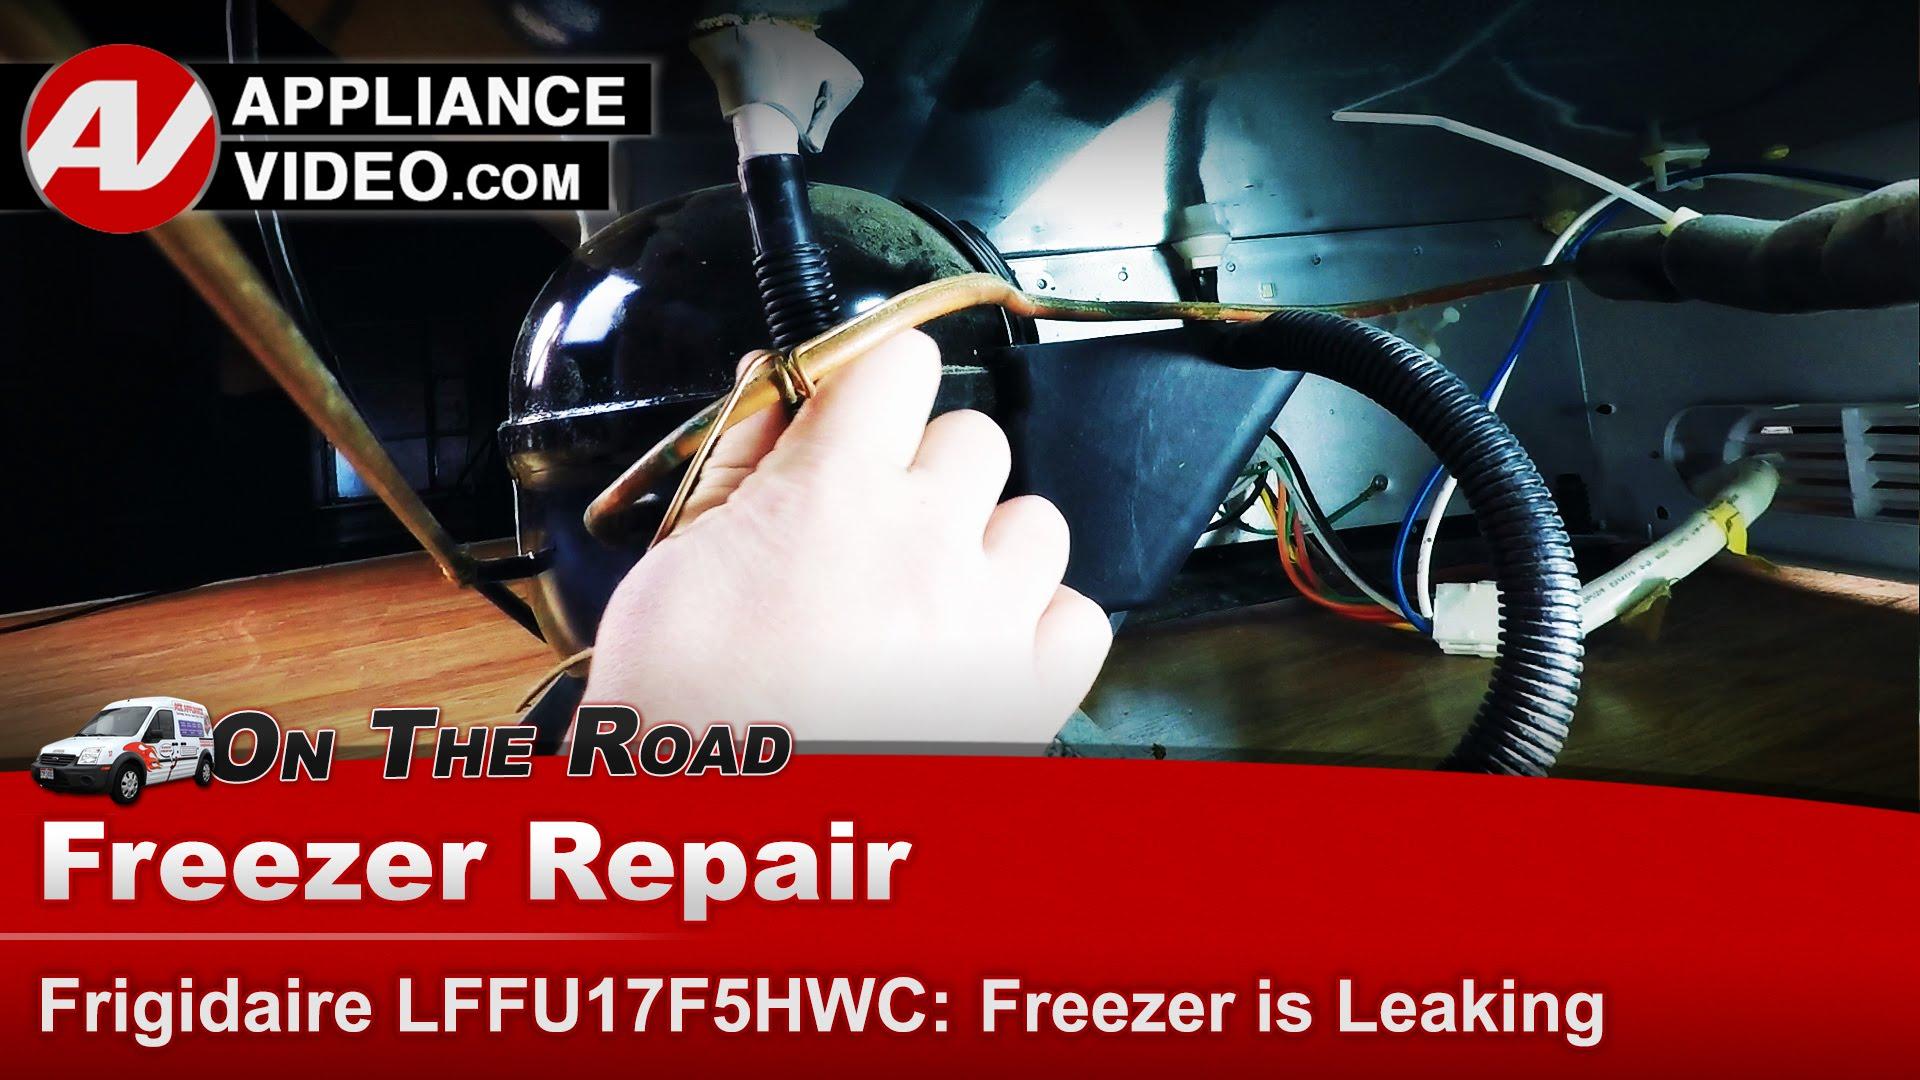 Frigidaire Freezer  Leaking water  LFFU17F5HWC  Drain Pan  Appliance Video